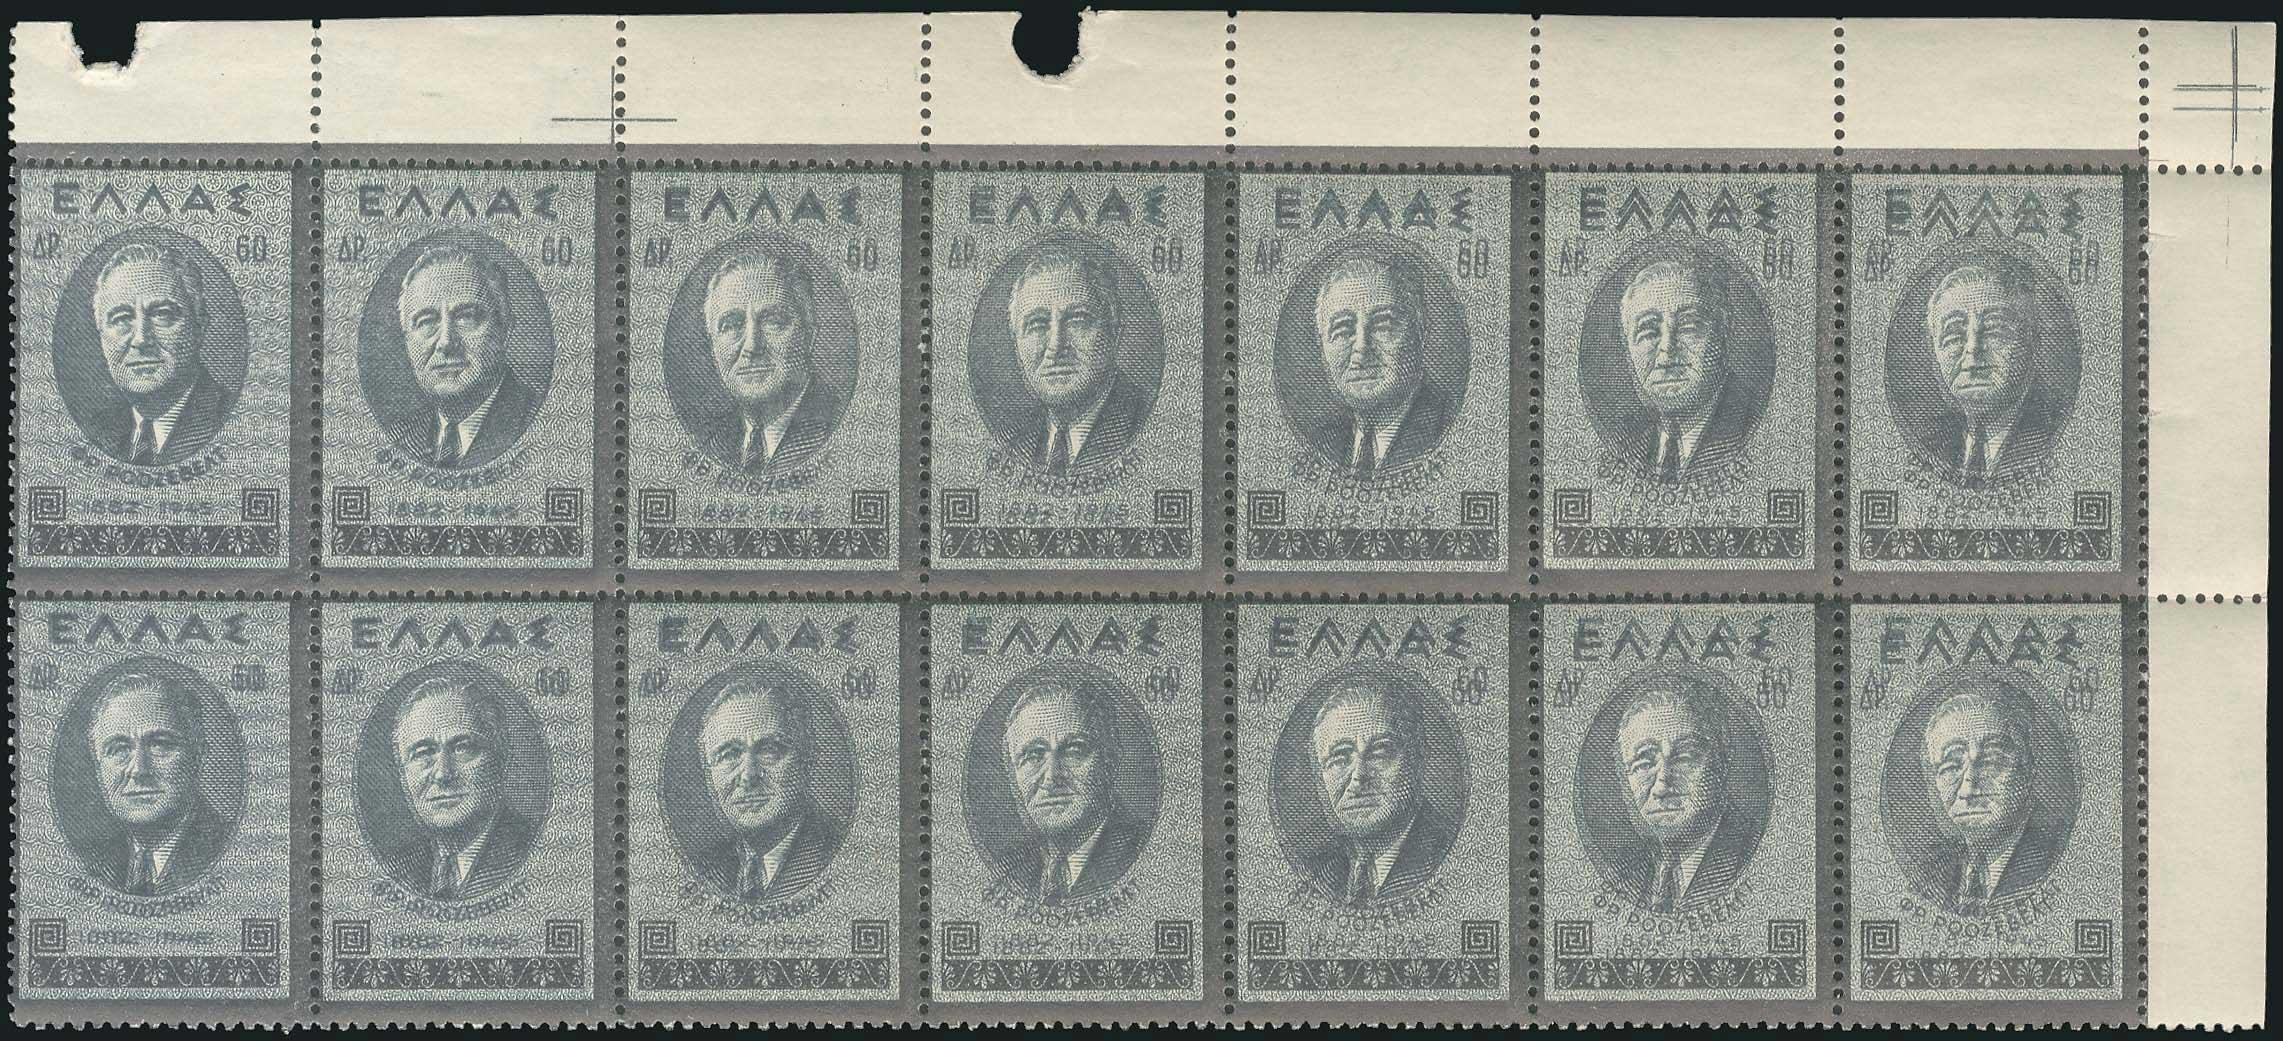 Lot 458 - - 1945-2016 1945-2016 -  A. Karamitsos Public Auction 648 General Stamp Sale